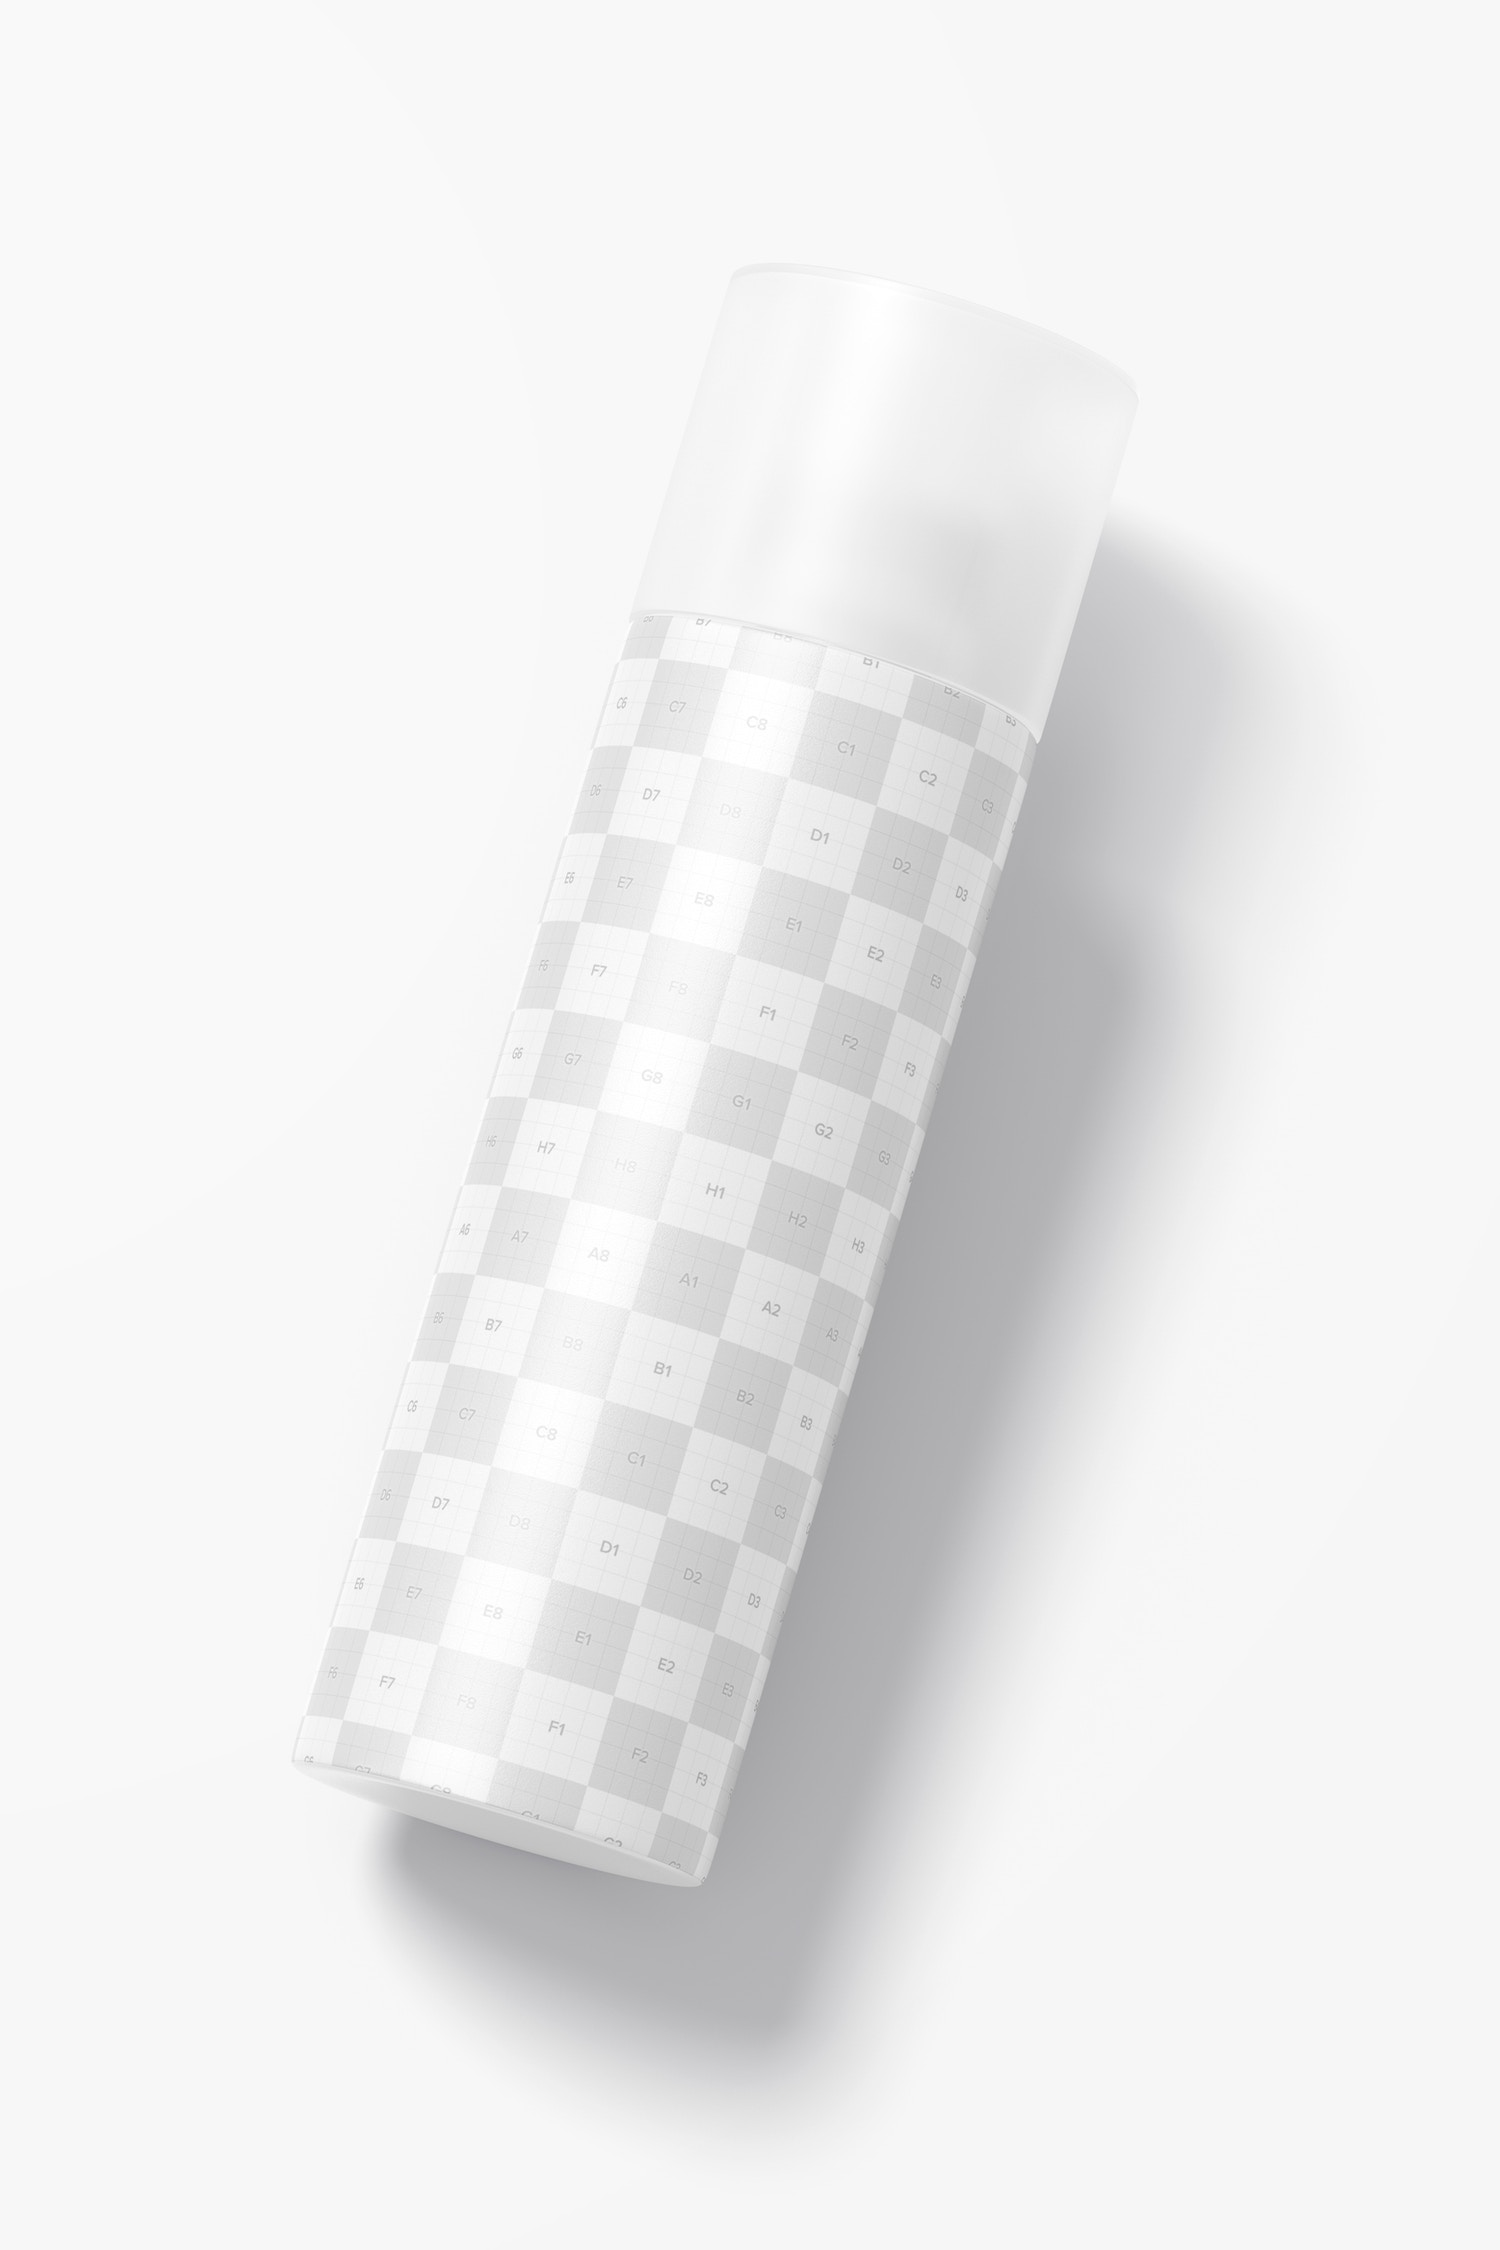 5 oz Plastic Bottle Mockup, Top View